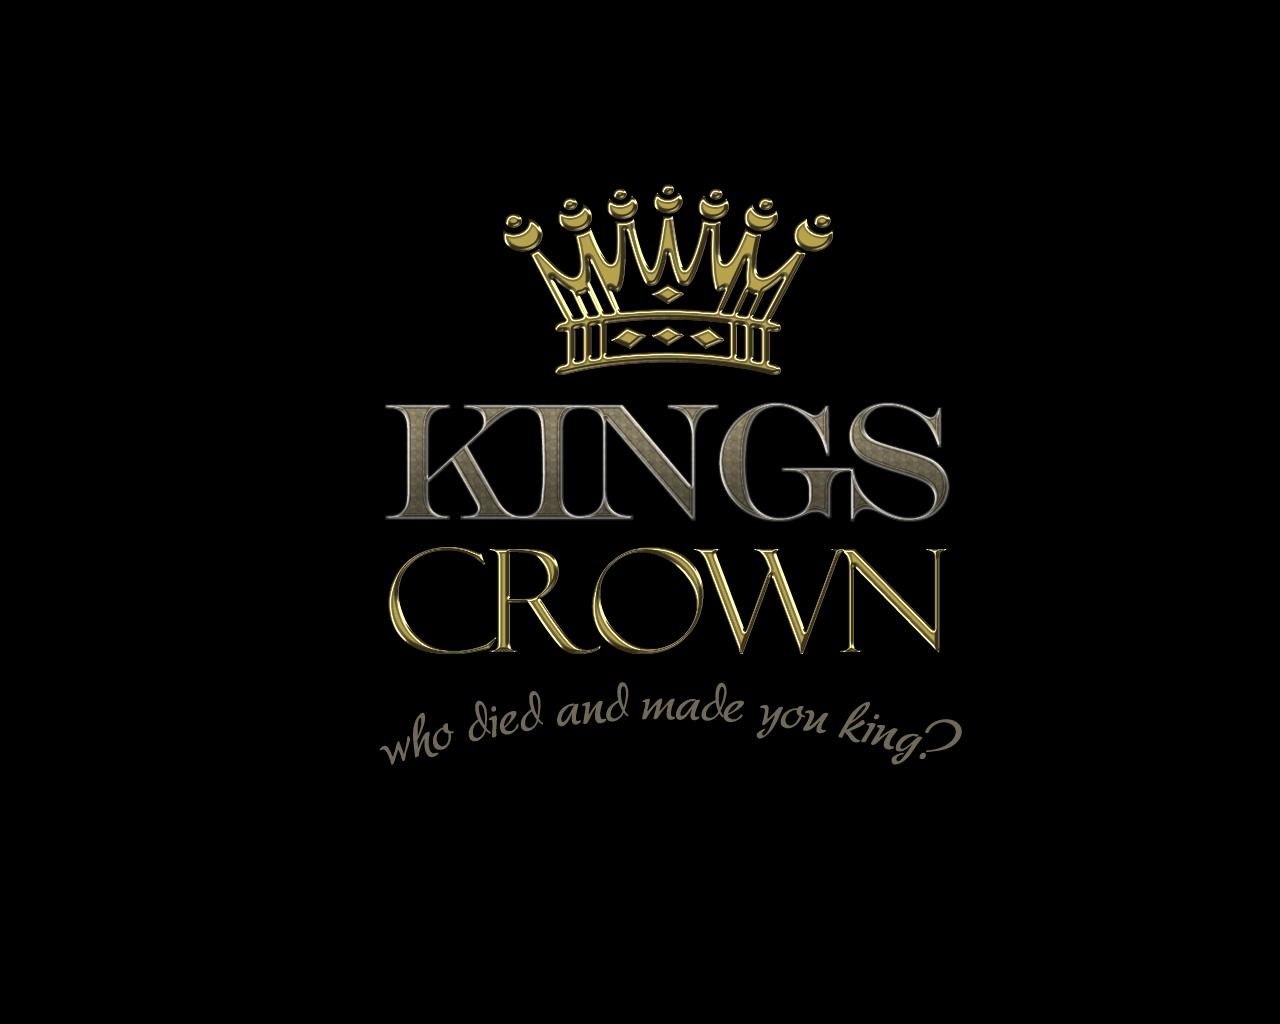 10 Most Popular La Kings Iphone 6 Wallpaper Full Hd 1920 1080 For Pc Desktop Iphone 6 Wallpaper La Kings Wallpaper